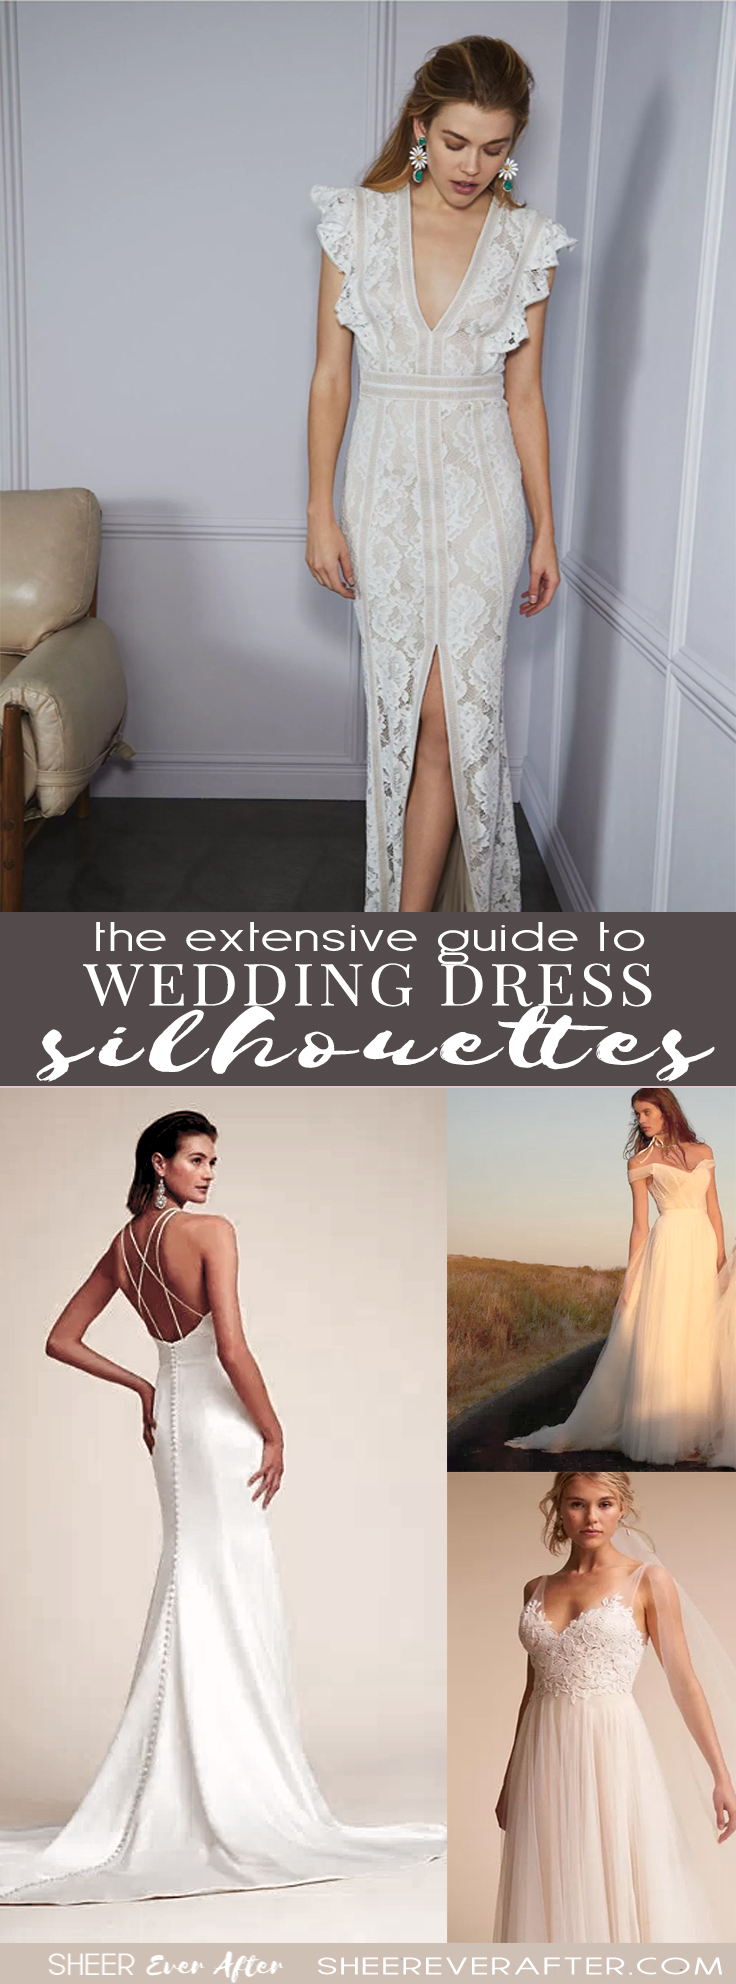 #weddingdress #weddingdresssilhouettes #bridalgown #bridal #weddingday #weddingideas #beautifuldress